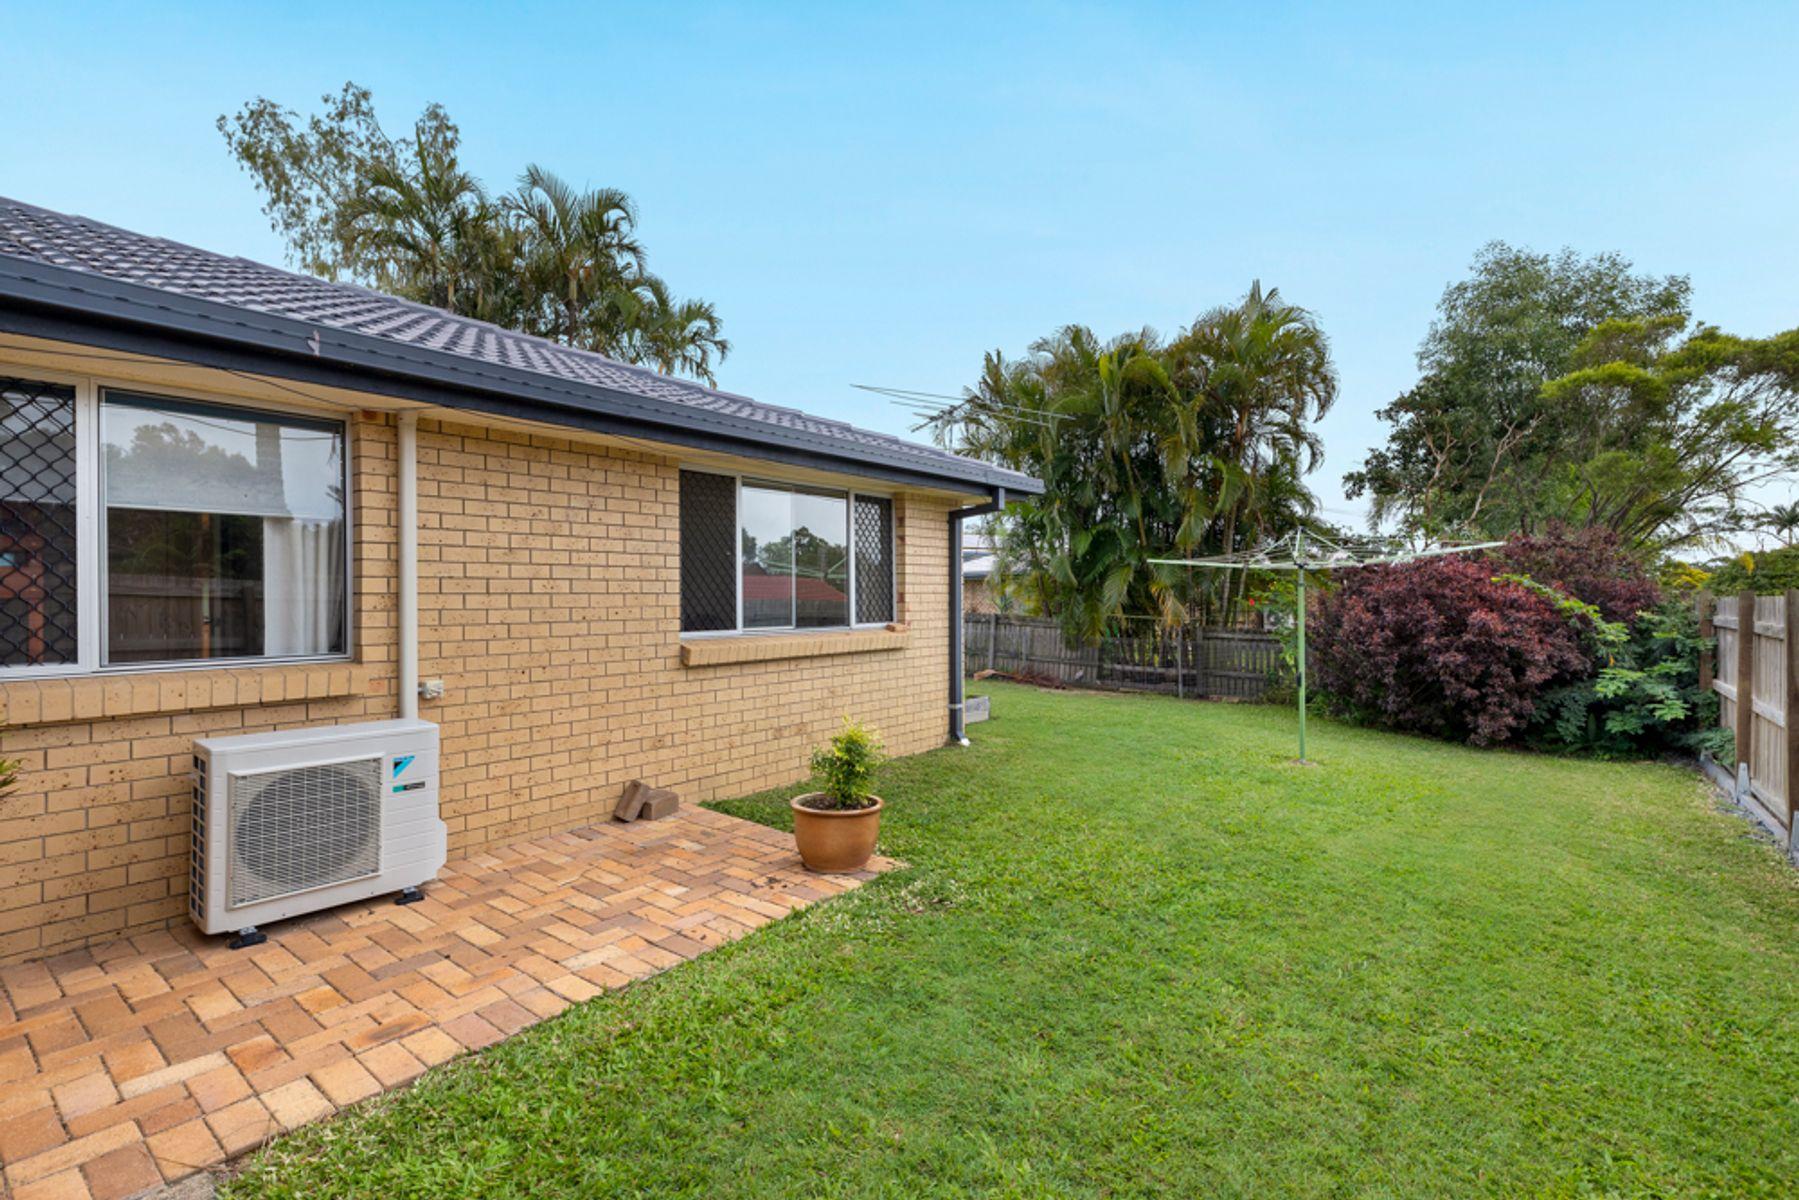 104 Killarney Crescent, Capalaba, QLD 4157